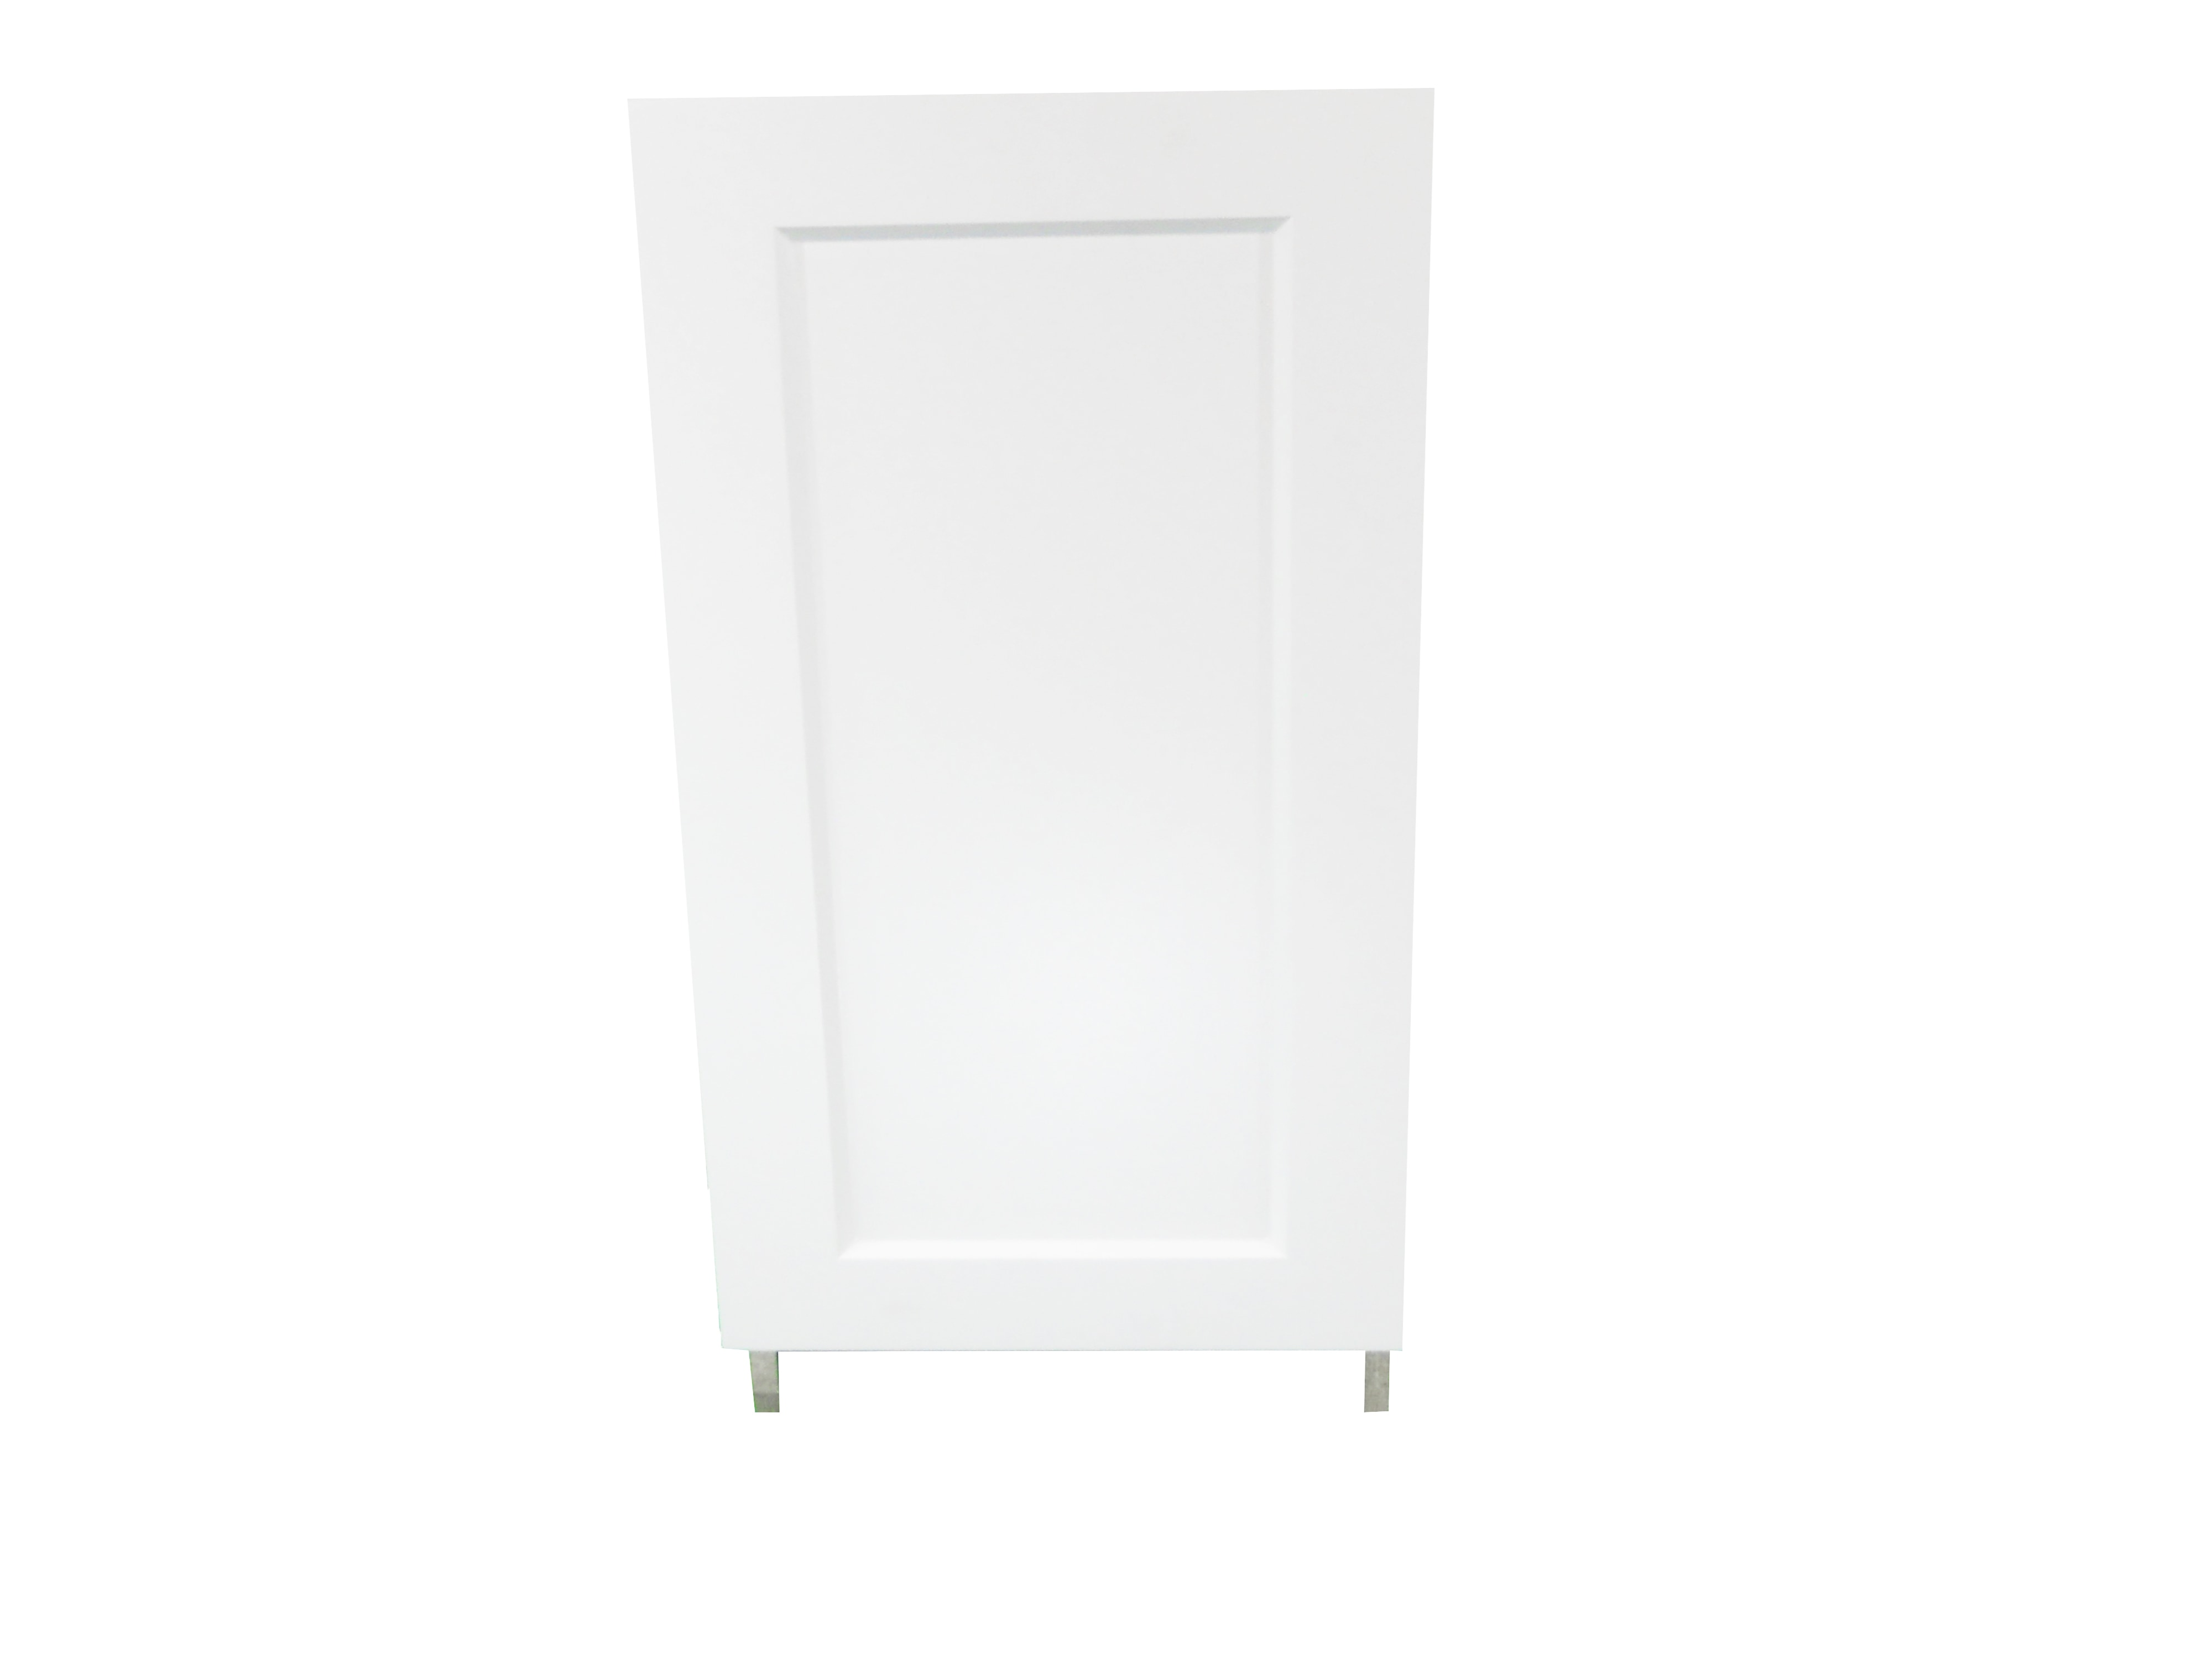 Base Cabinet With Door / Wistler White / Flat Panel White / 18 Whistler White 0